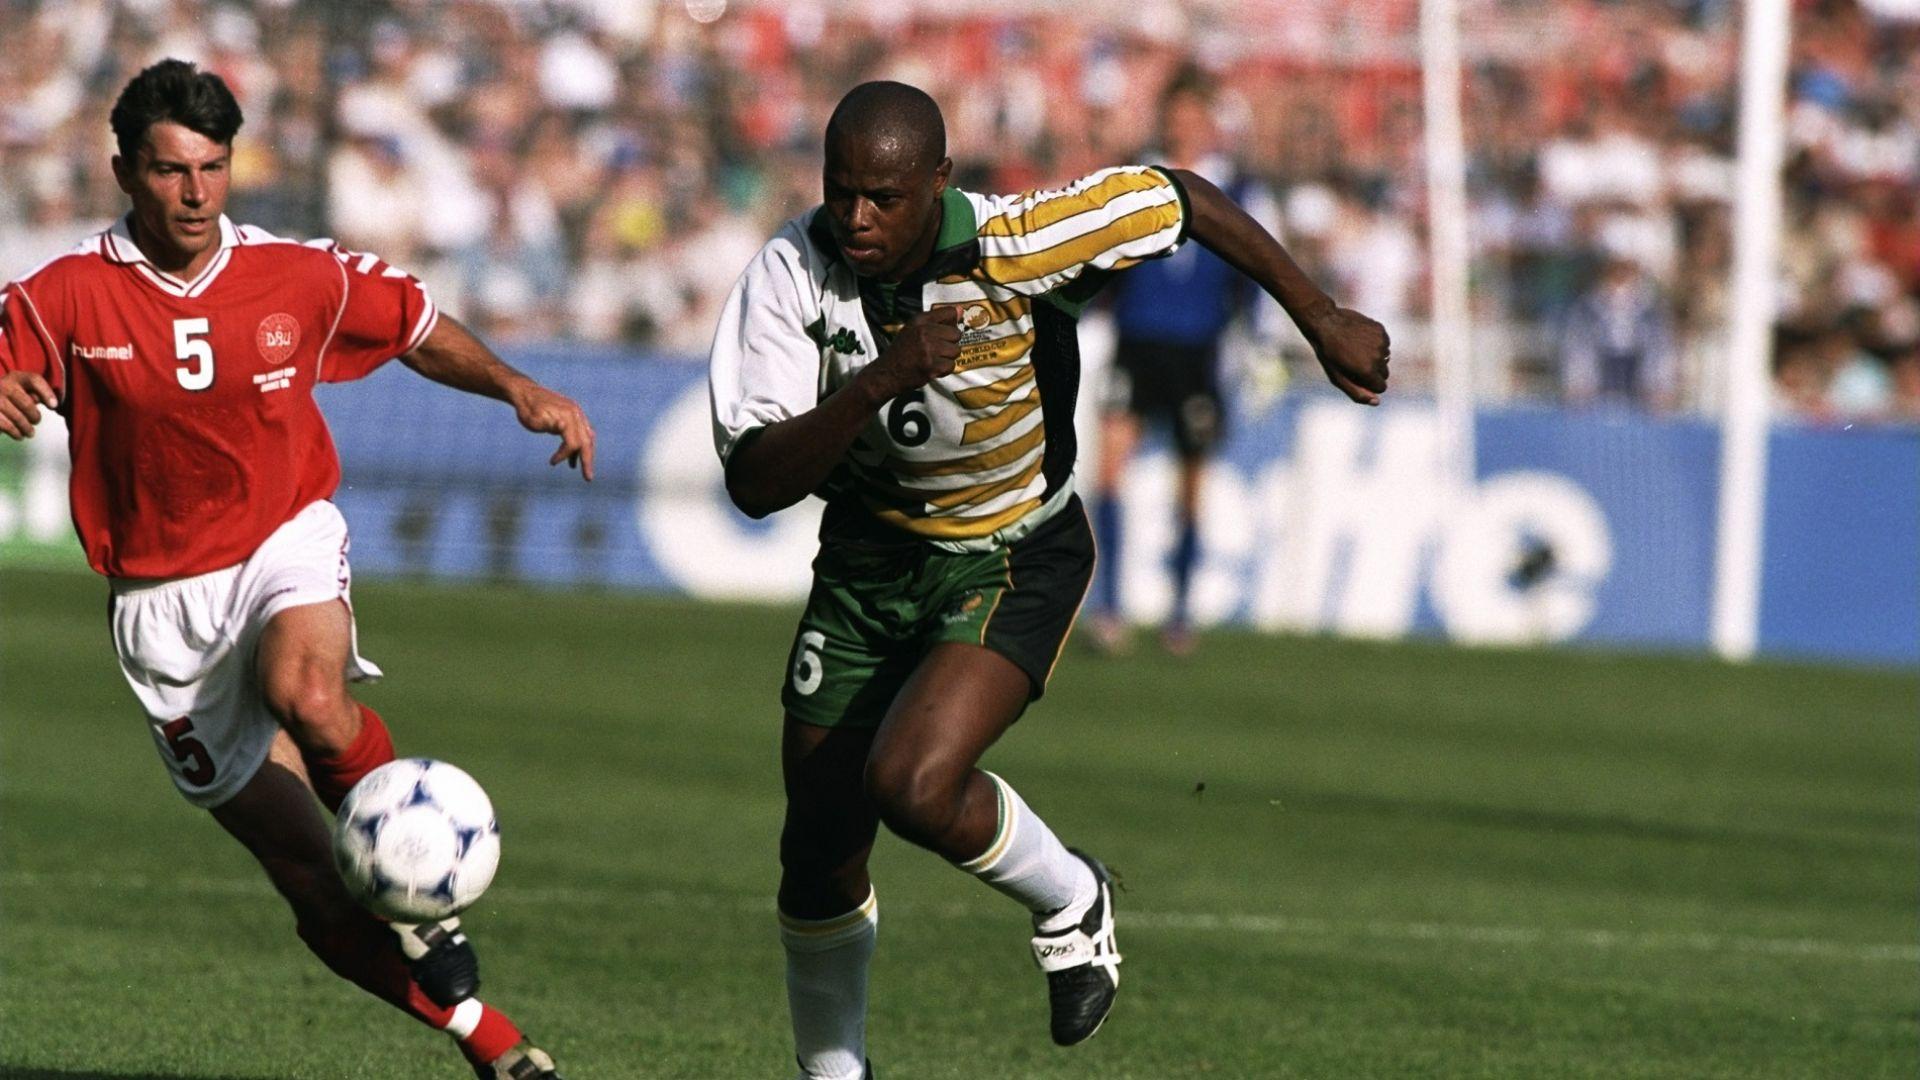 Африканска легенда почина на 49